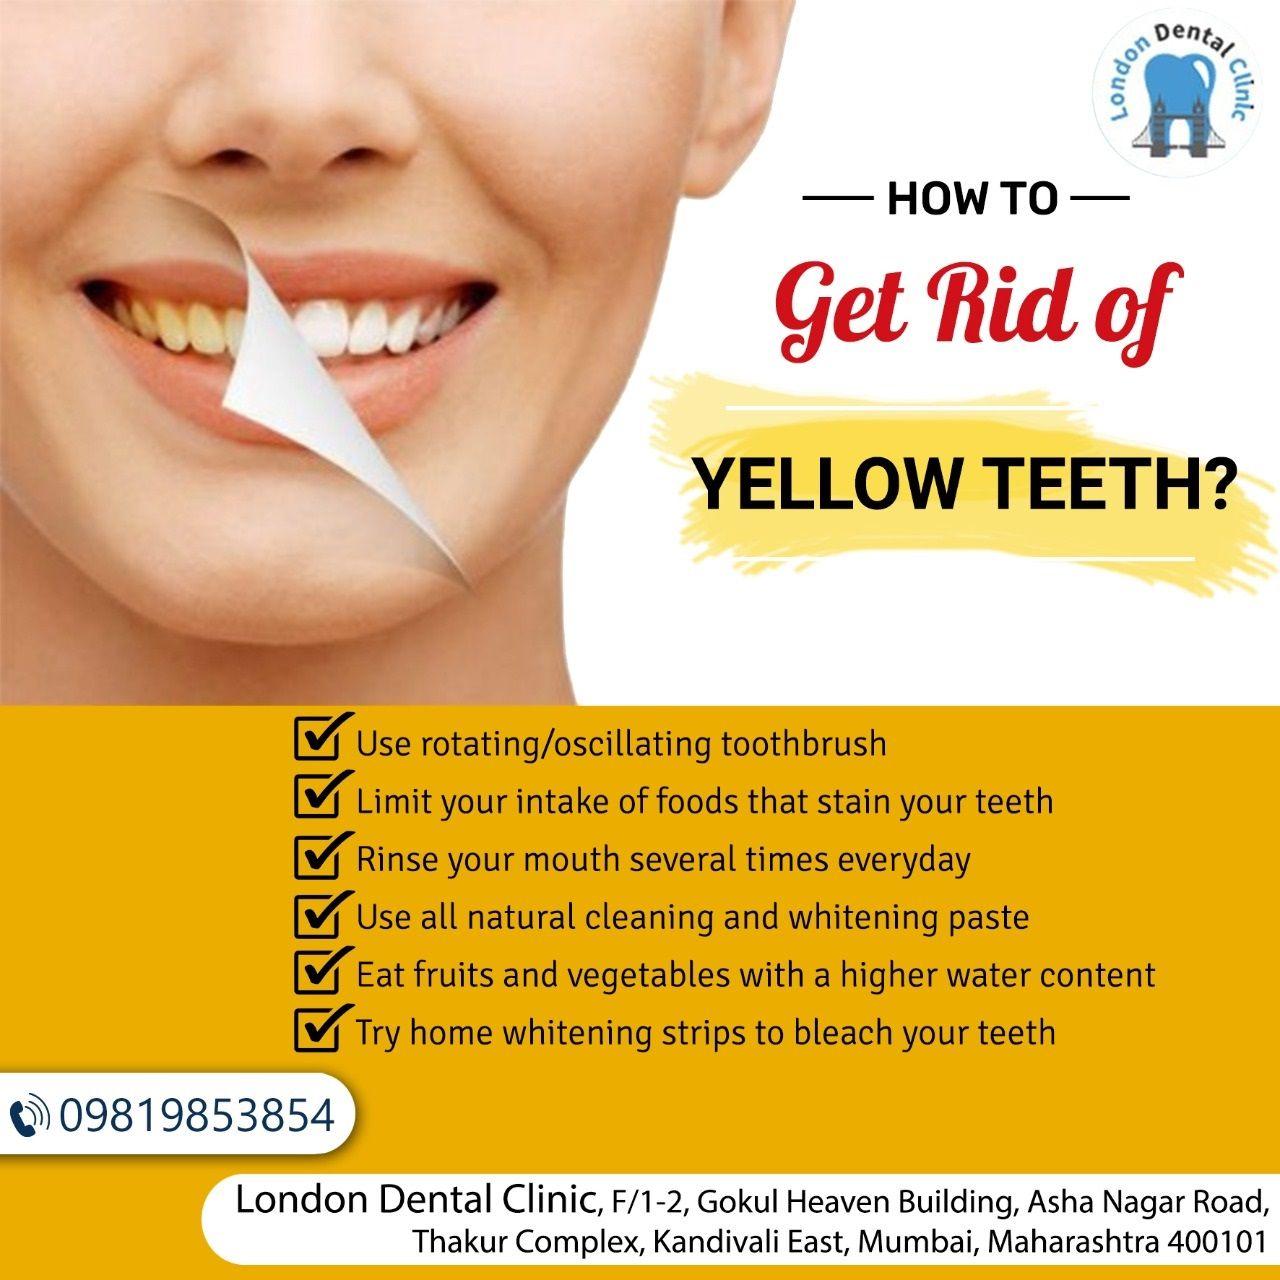 How to Get Rid of Yellow Teeth? Dental cosmetics